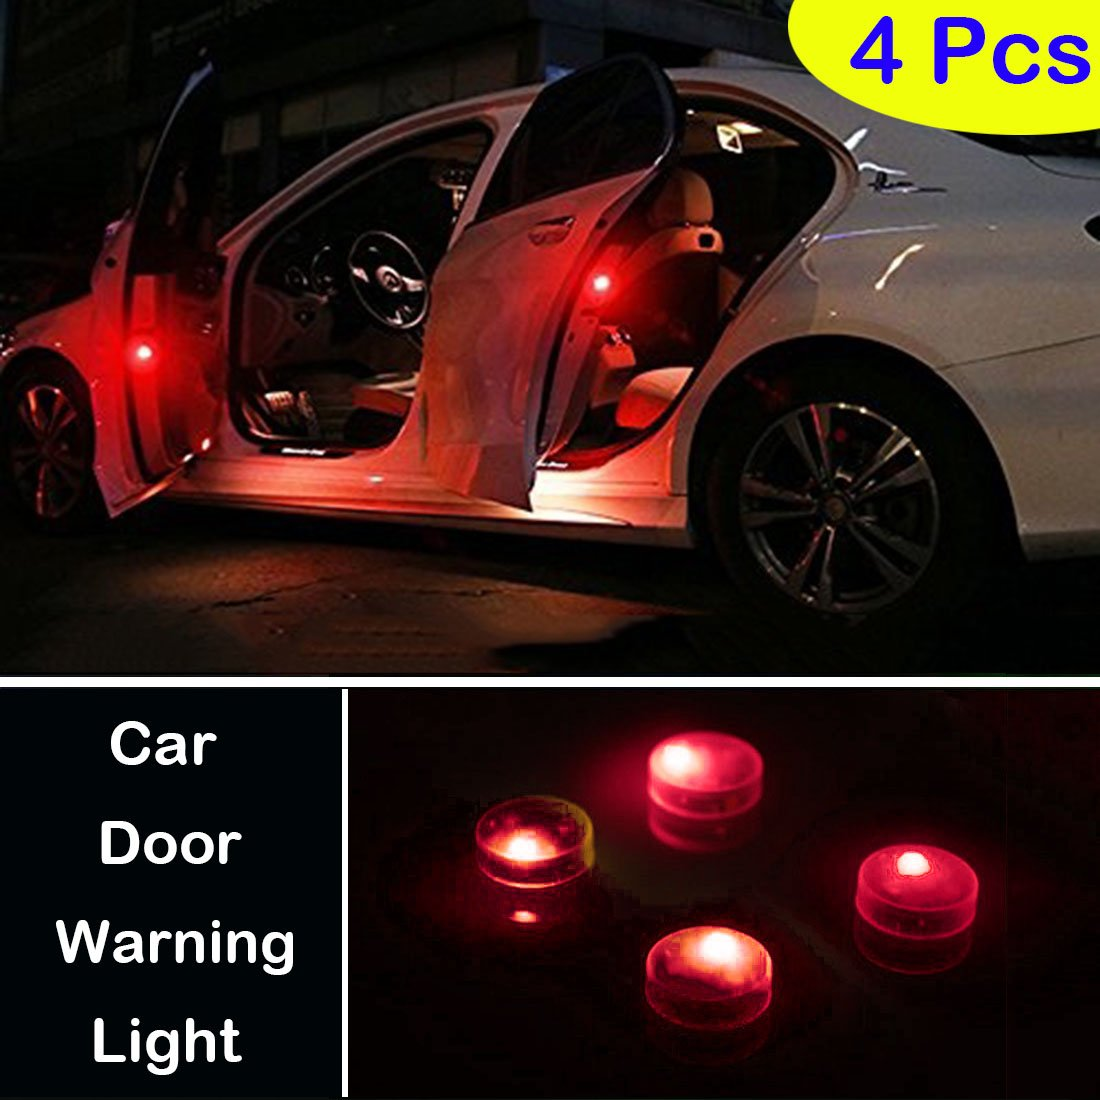 Botepon 4PCS Universal Wireless Car Door LED Warning Light, Waterproof LED Strobe Flicker for Anti Rear-end Collision (Blue) 20134130222